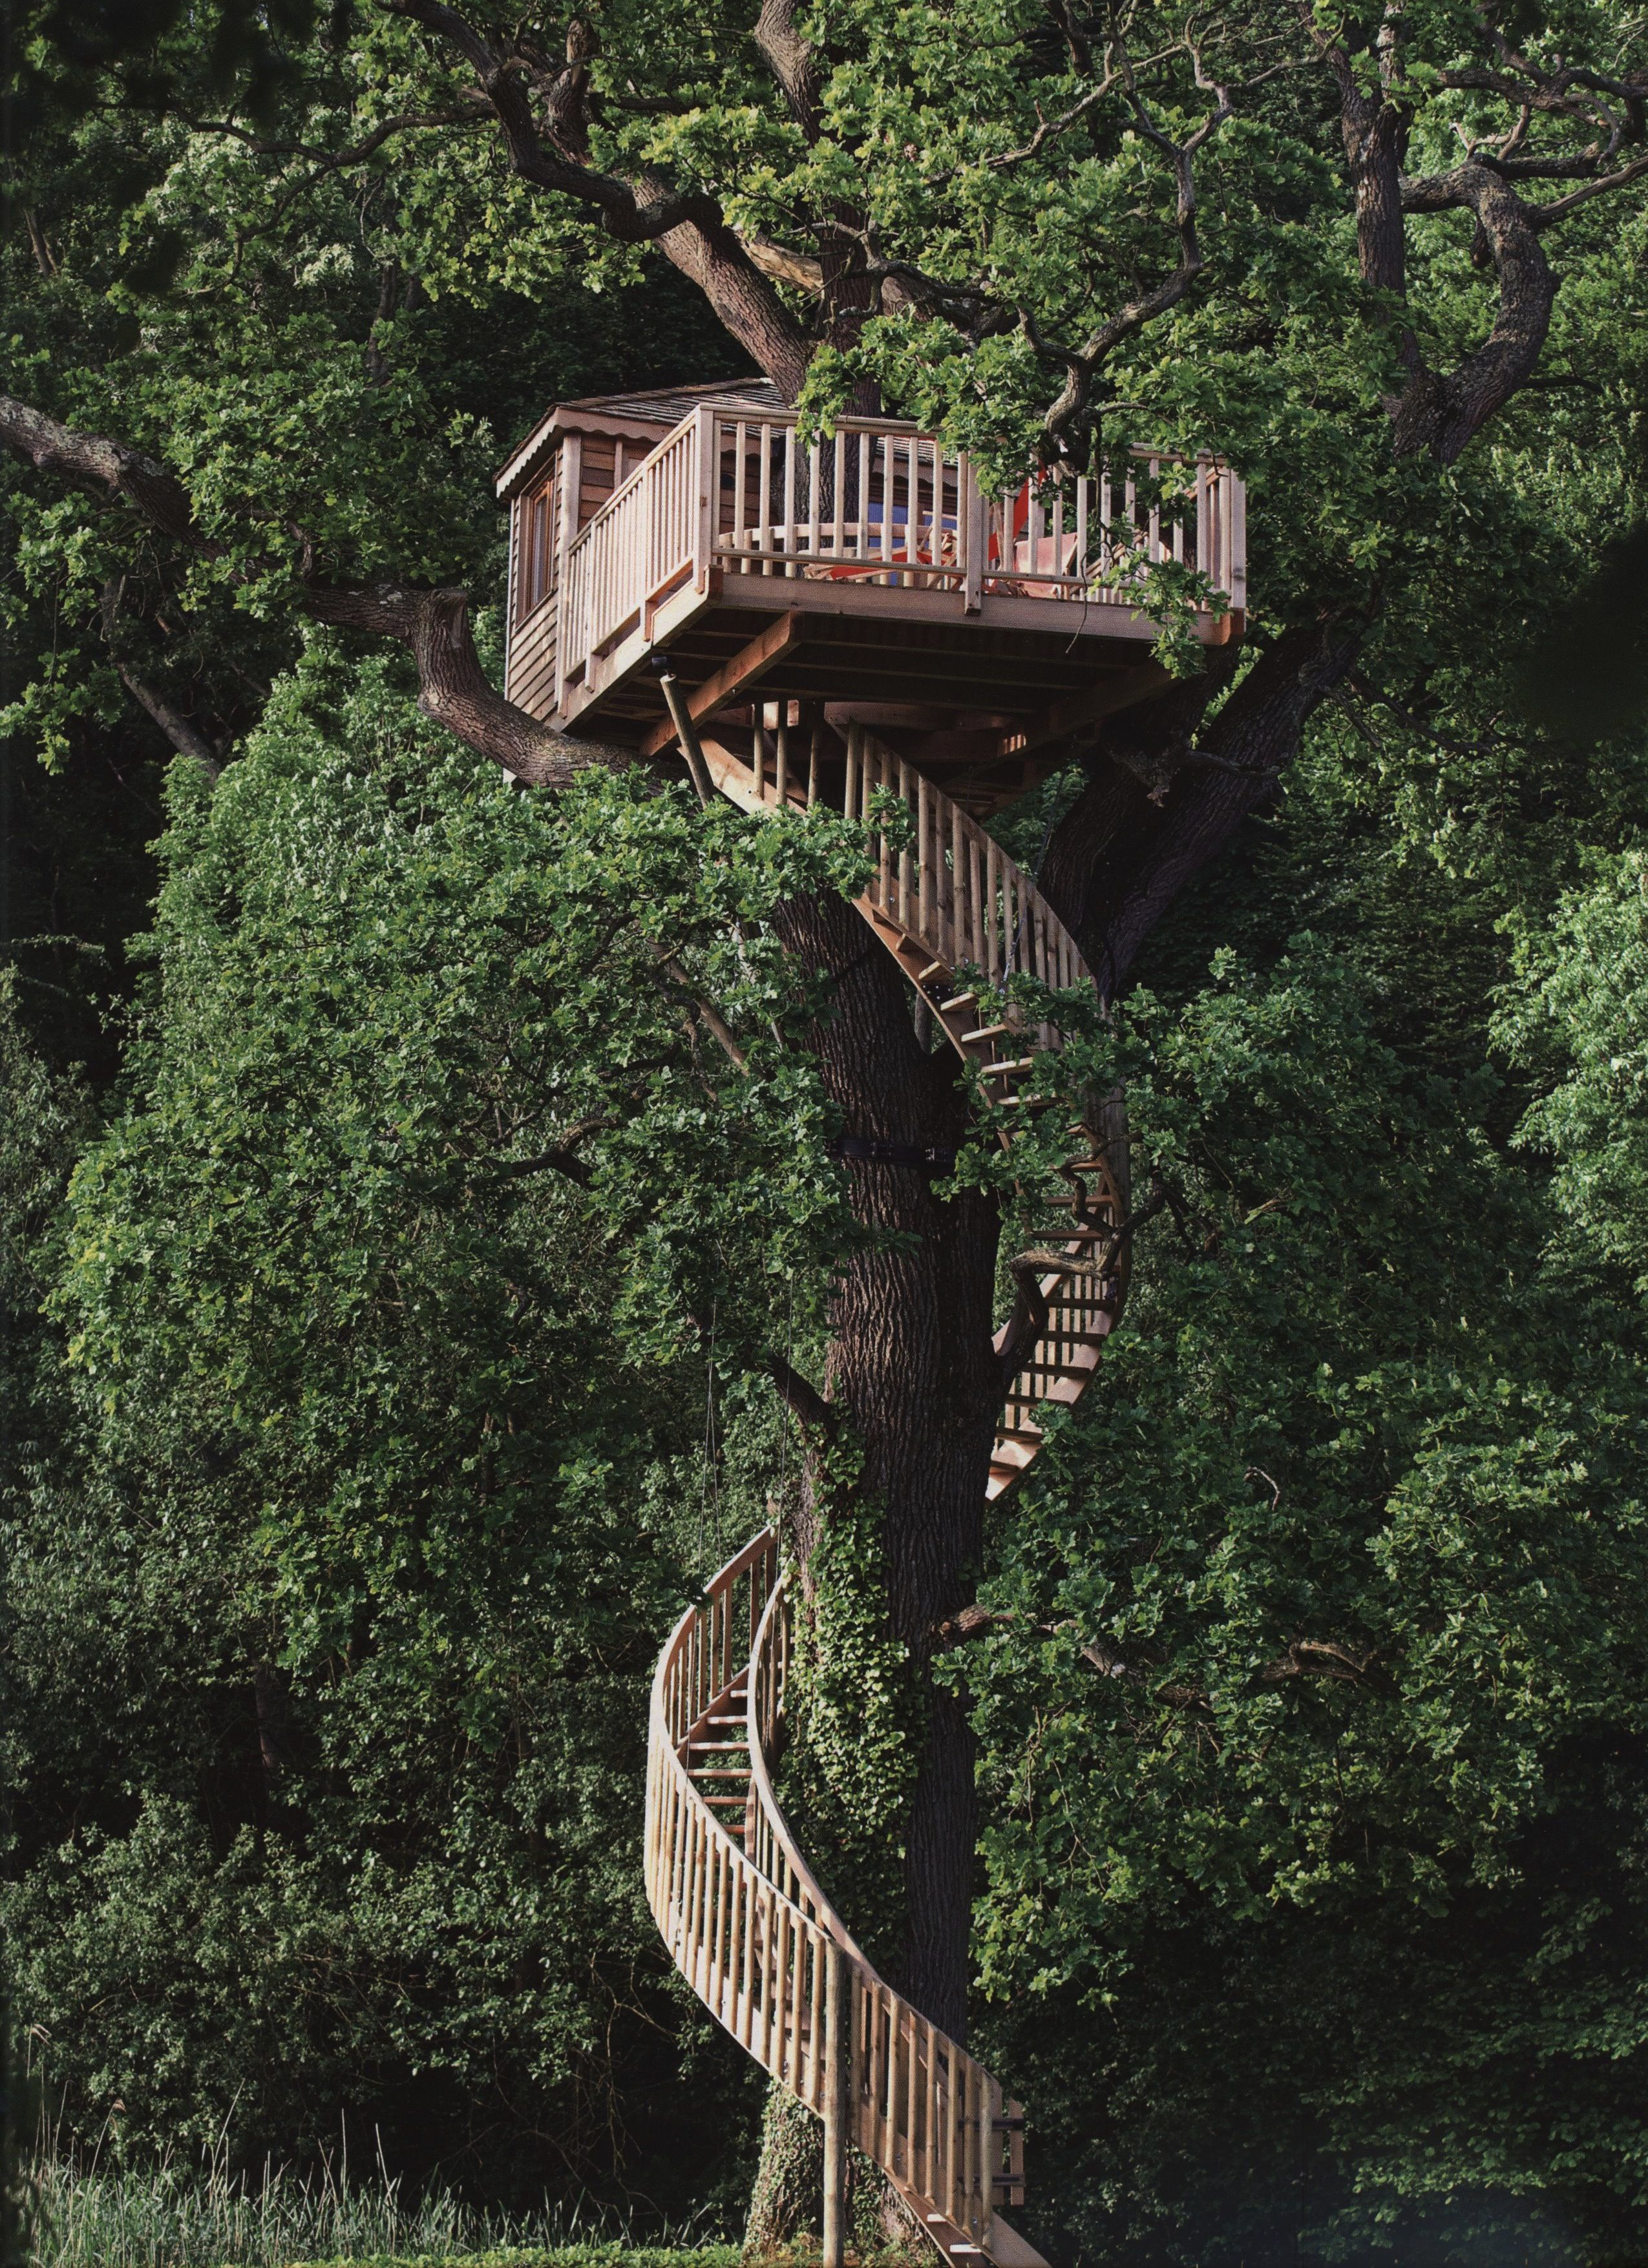 Treehouse Cool Tree Houses Tree House Building A Treehouse